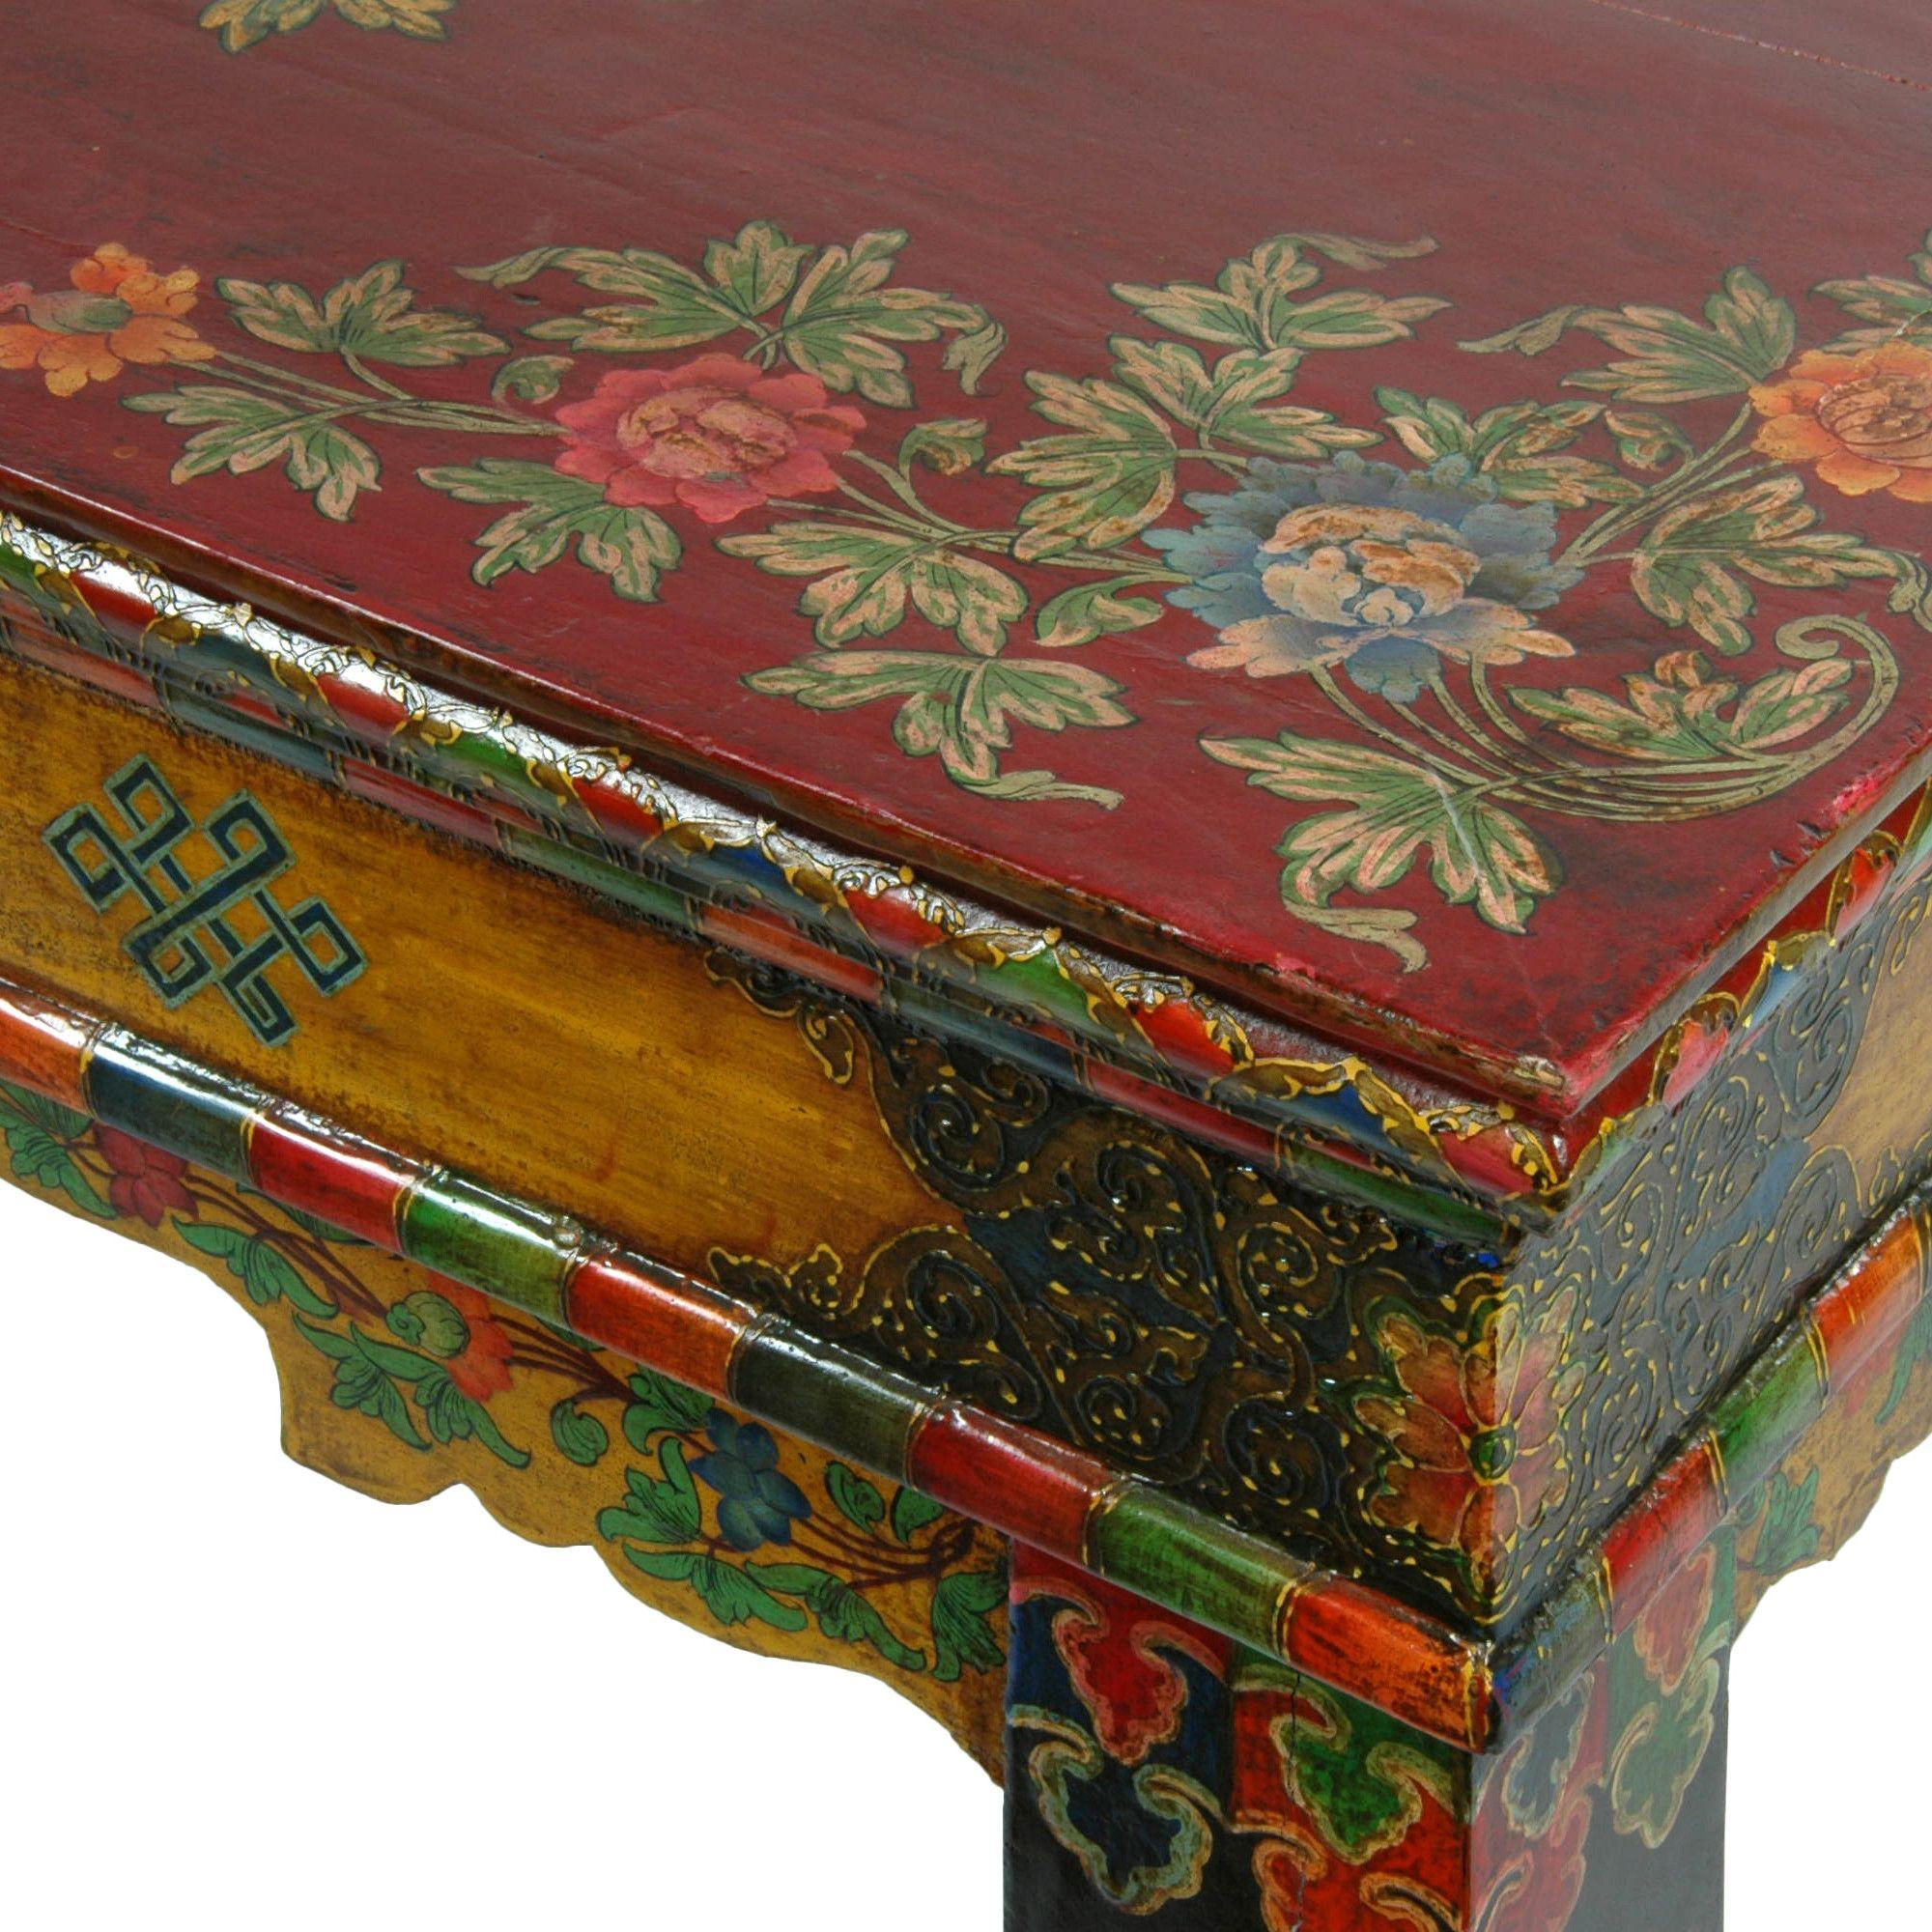 Reproduction Of A Traditional Tibetan Prayer Table Tibetan Rugs, Bhutan,  Furniture Design, Painted